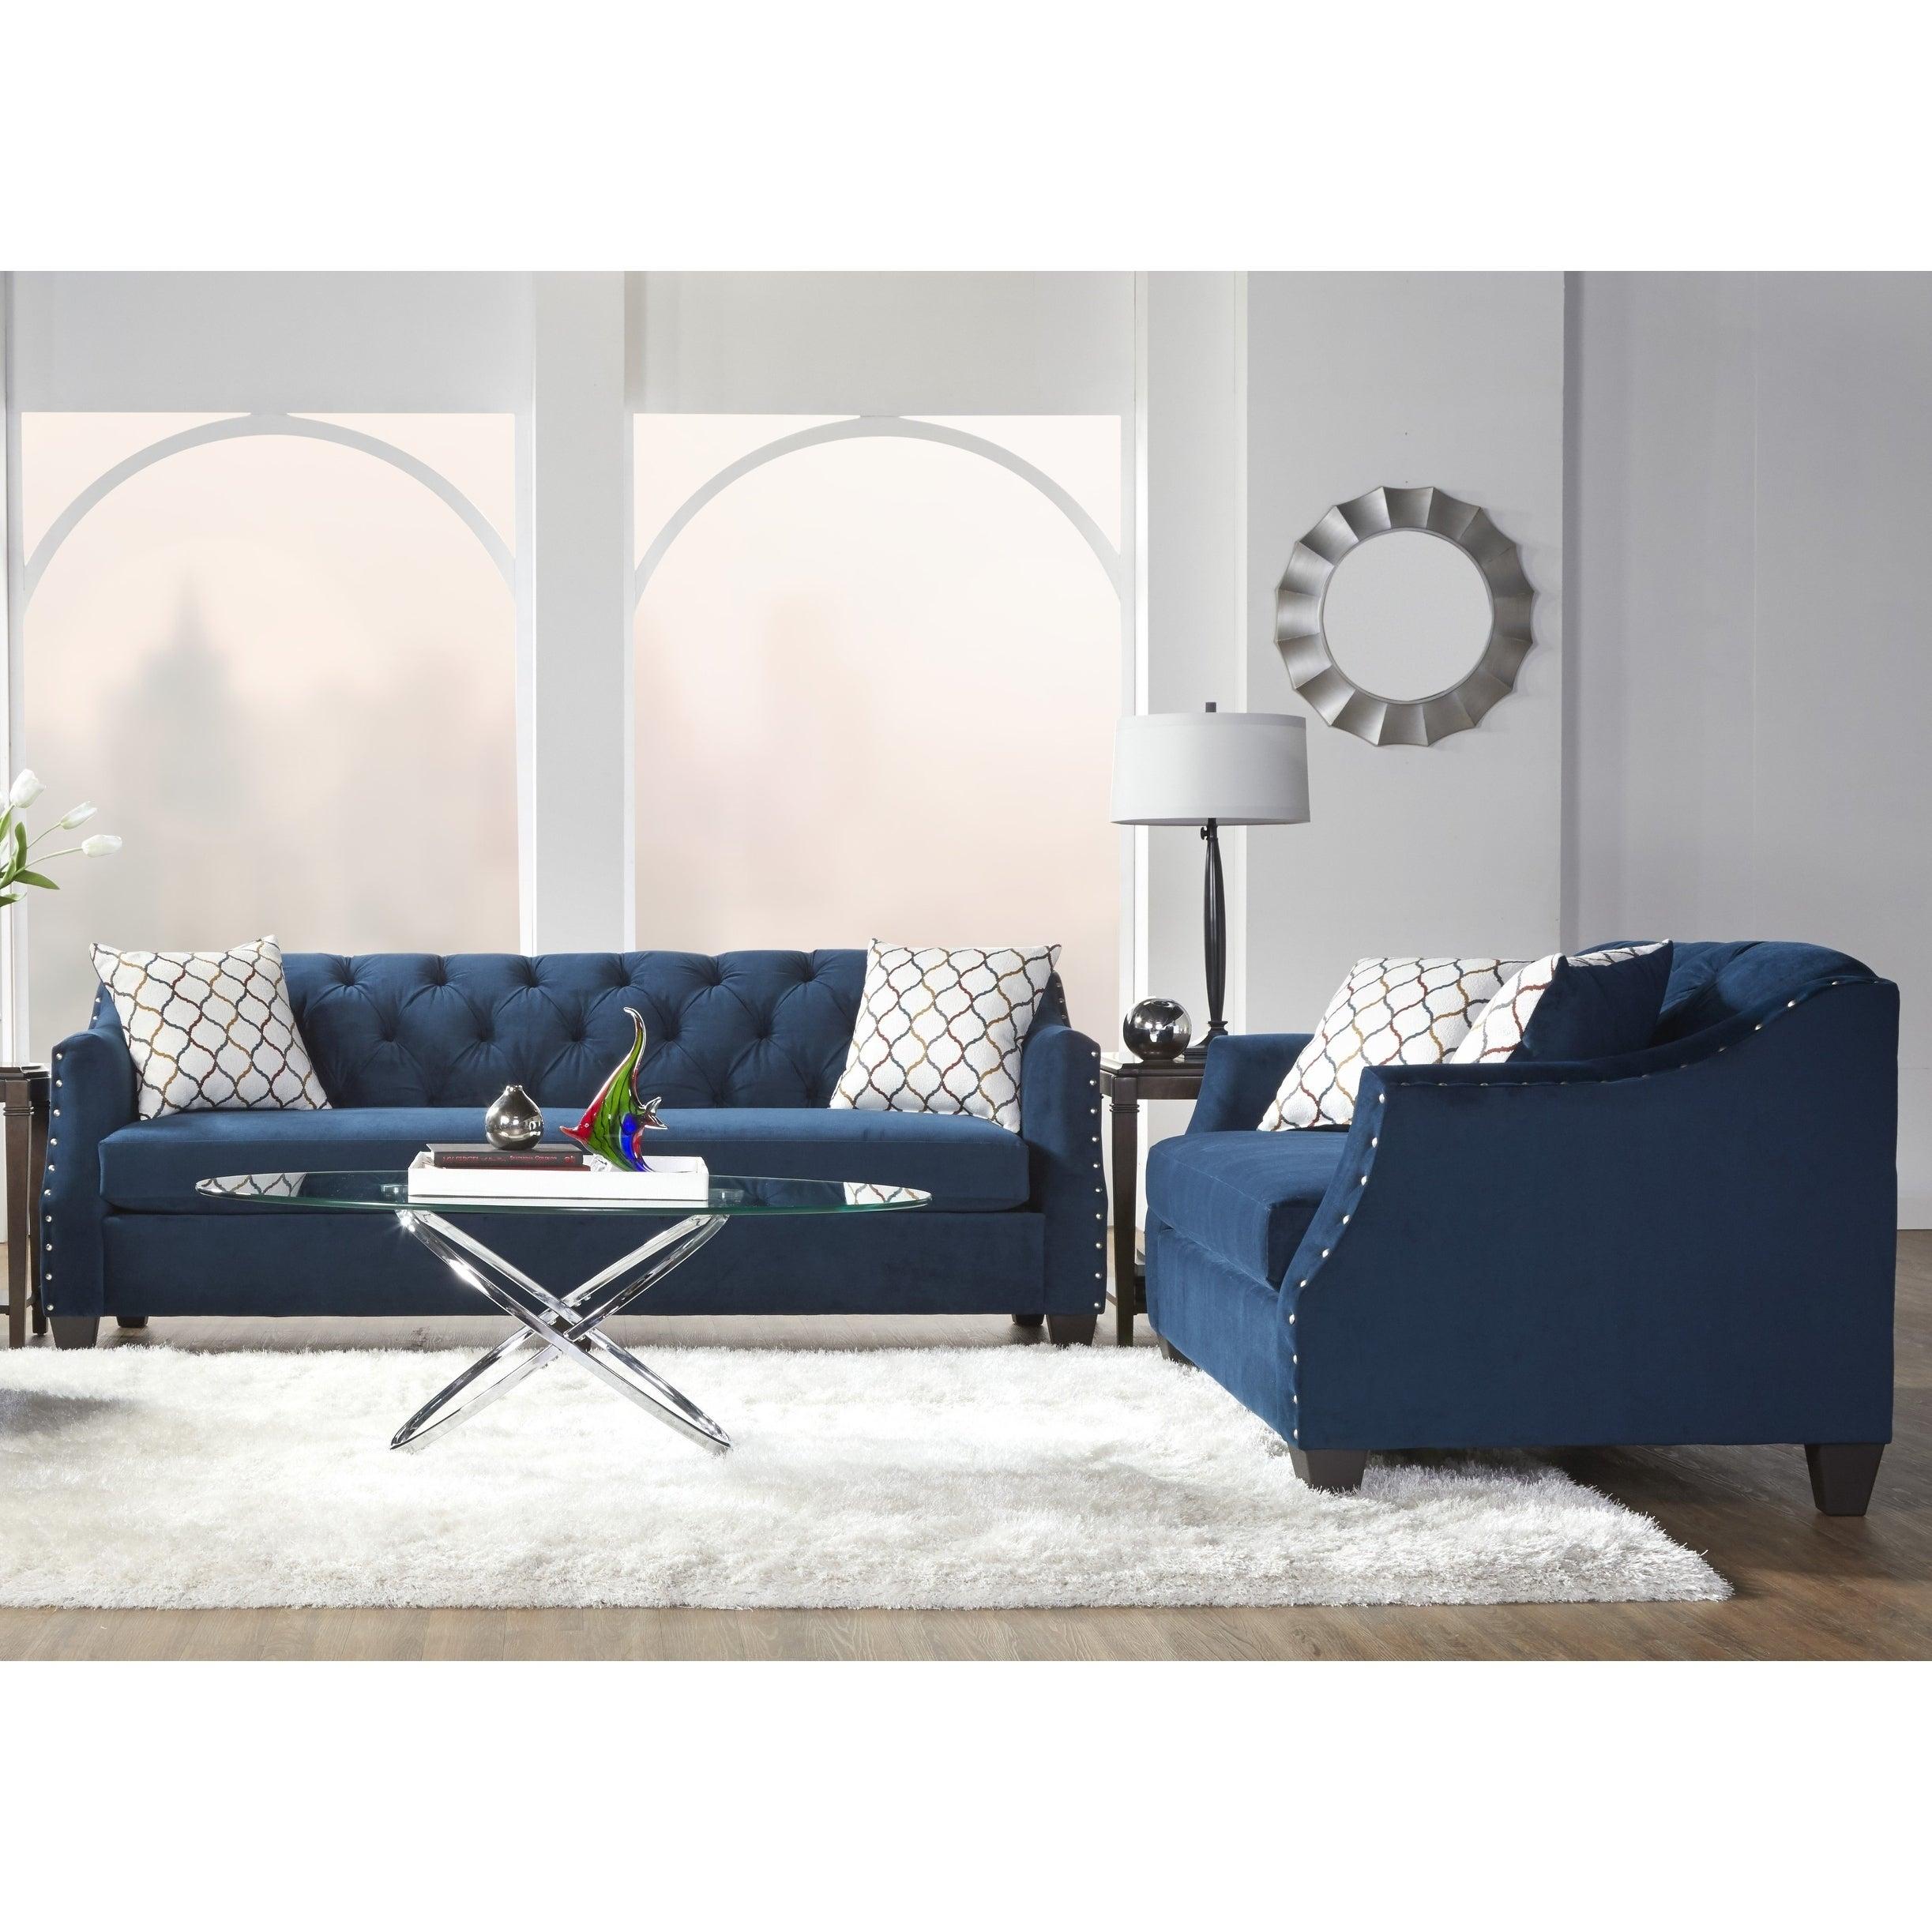 Moselle Transitional Modern Velvet Tufted Nainhead Trim Sofa and Loveseat  Set, Blue